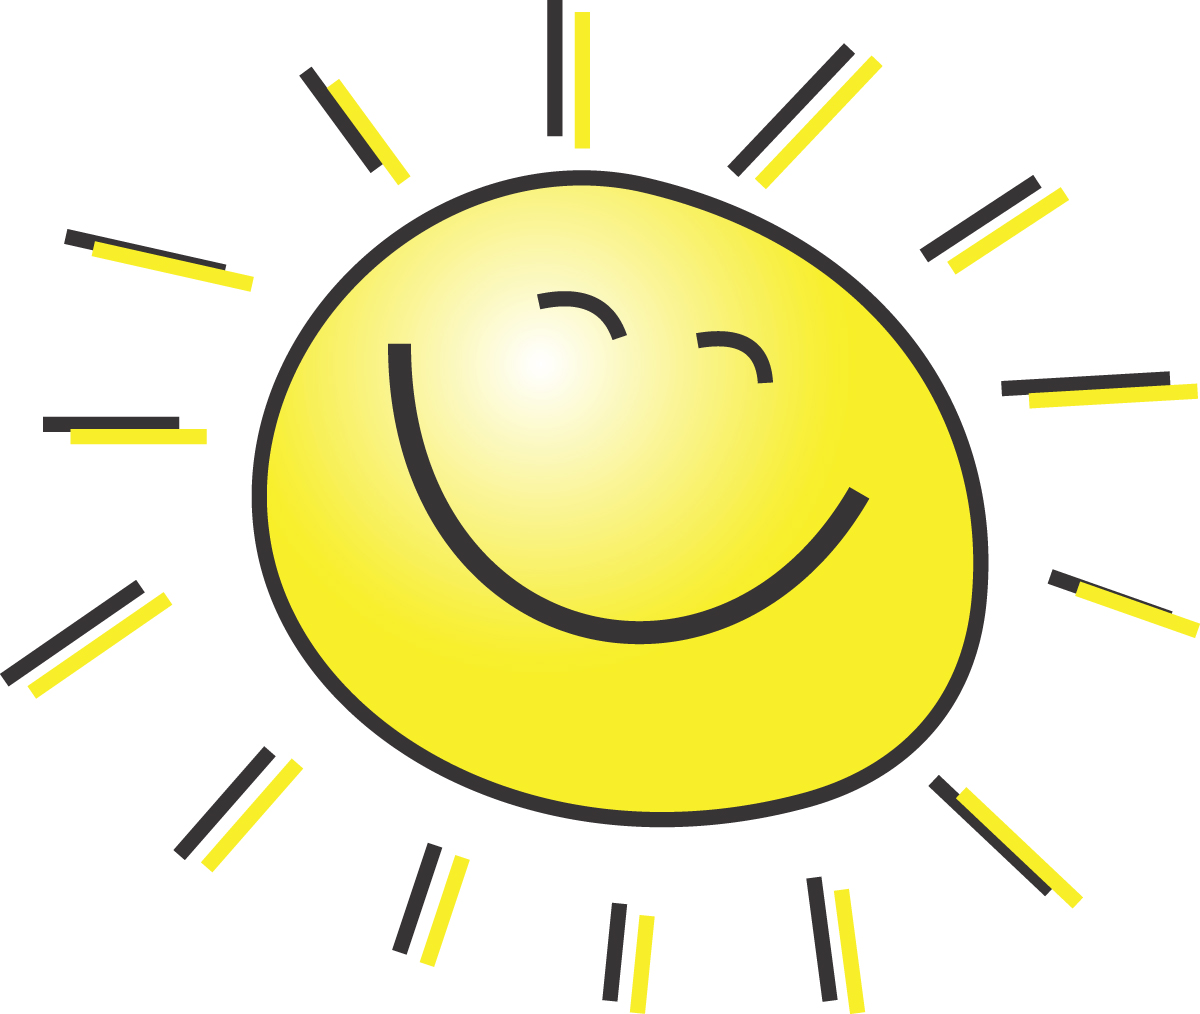 Good Morning Morning Sun Cartoon Clipart-Good morning morning sun cartoon clipart-16